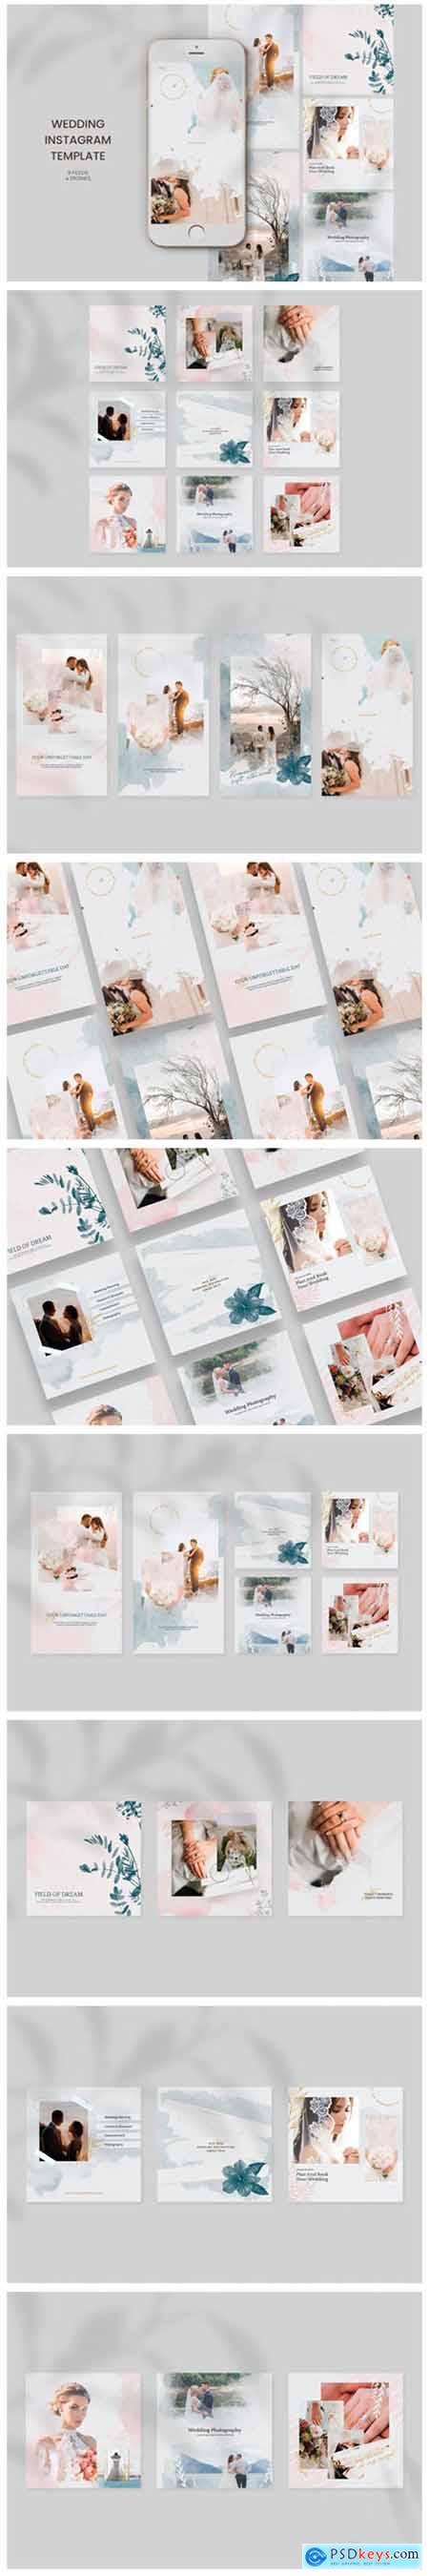 Wedding Instagram Templates 2658650